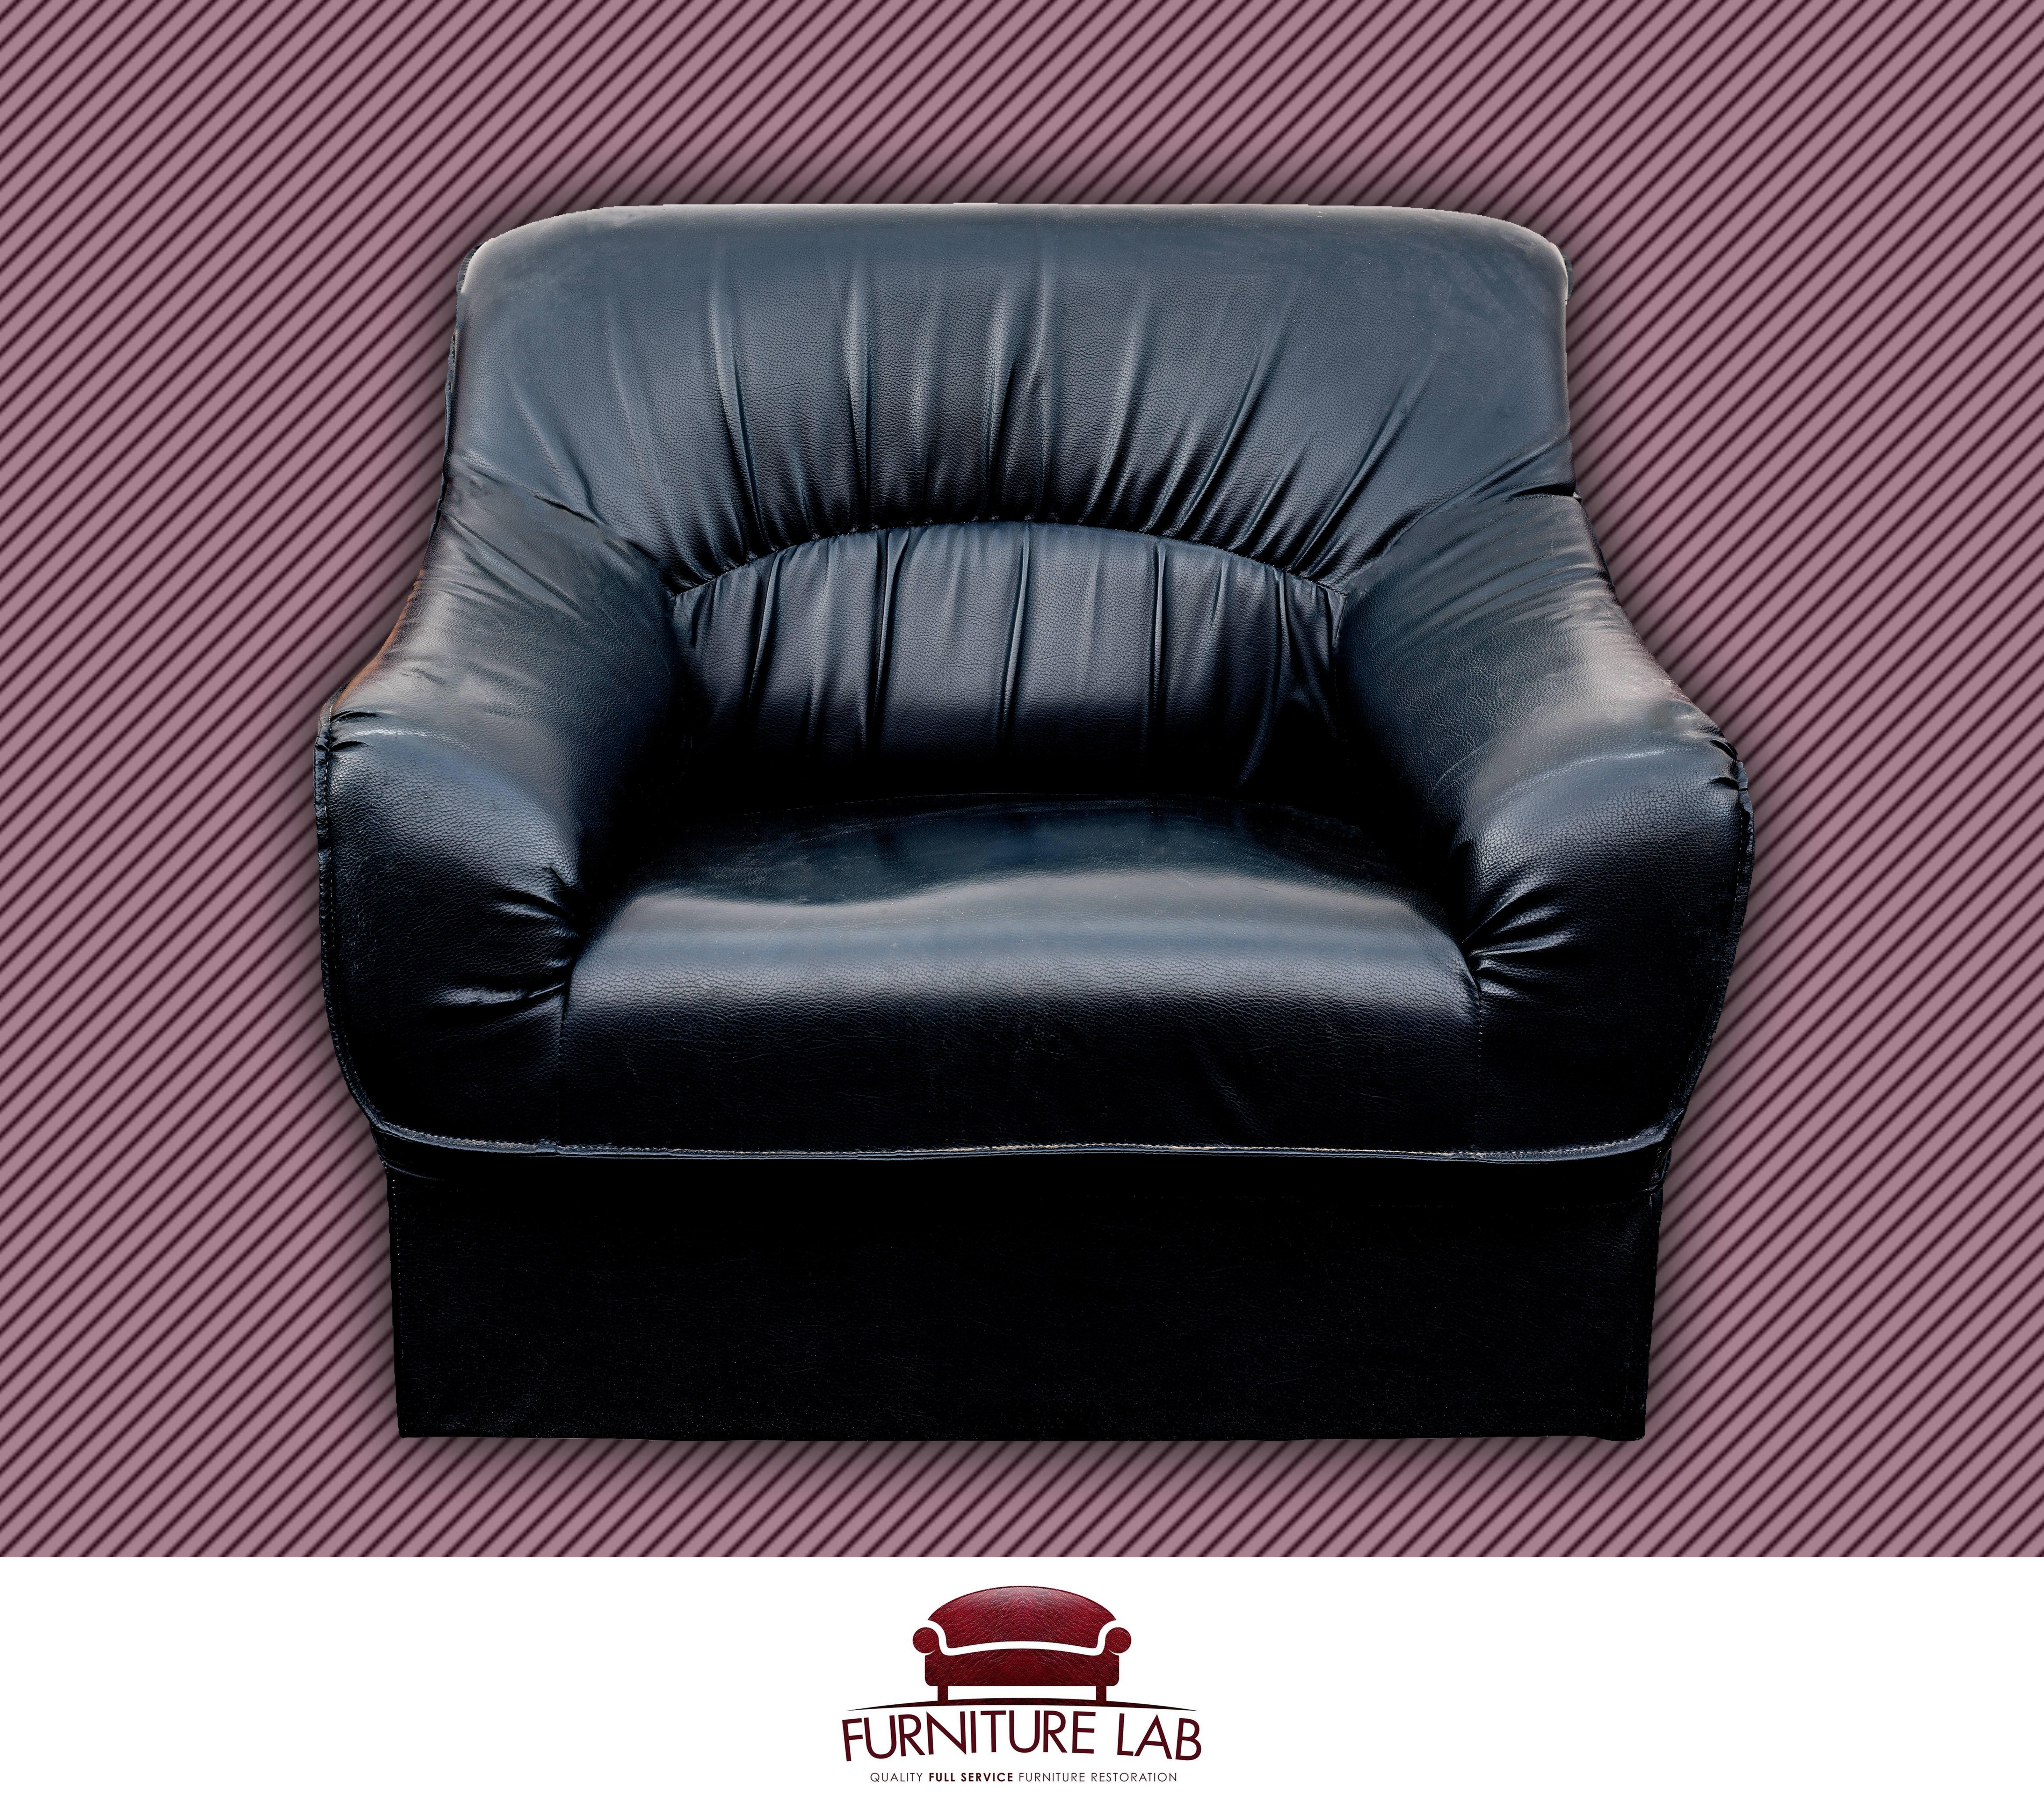 furniture-restoration-lab-las-vegas-after-repair